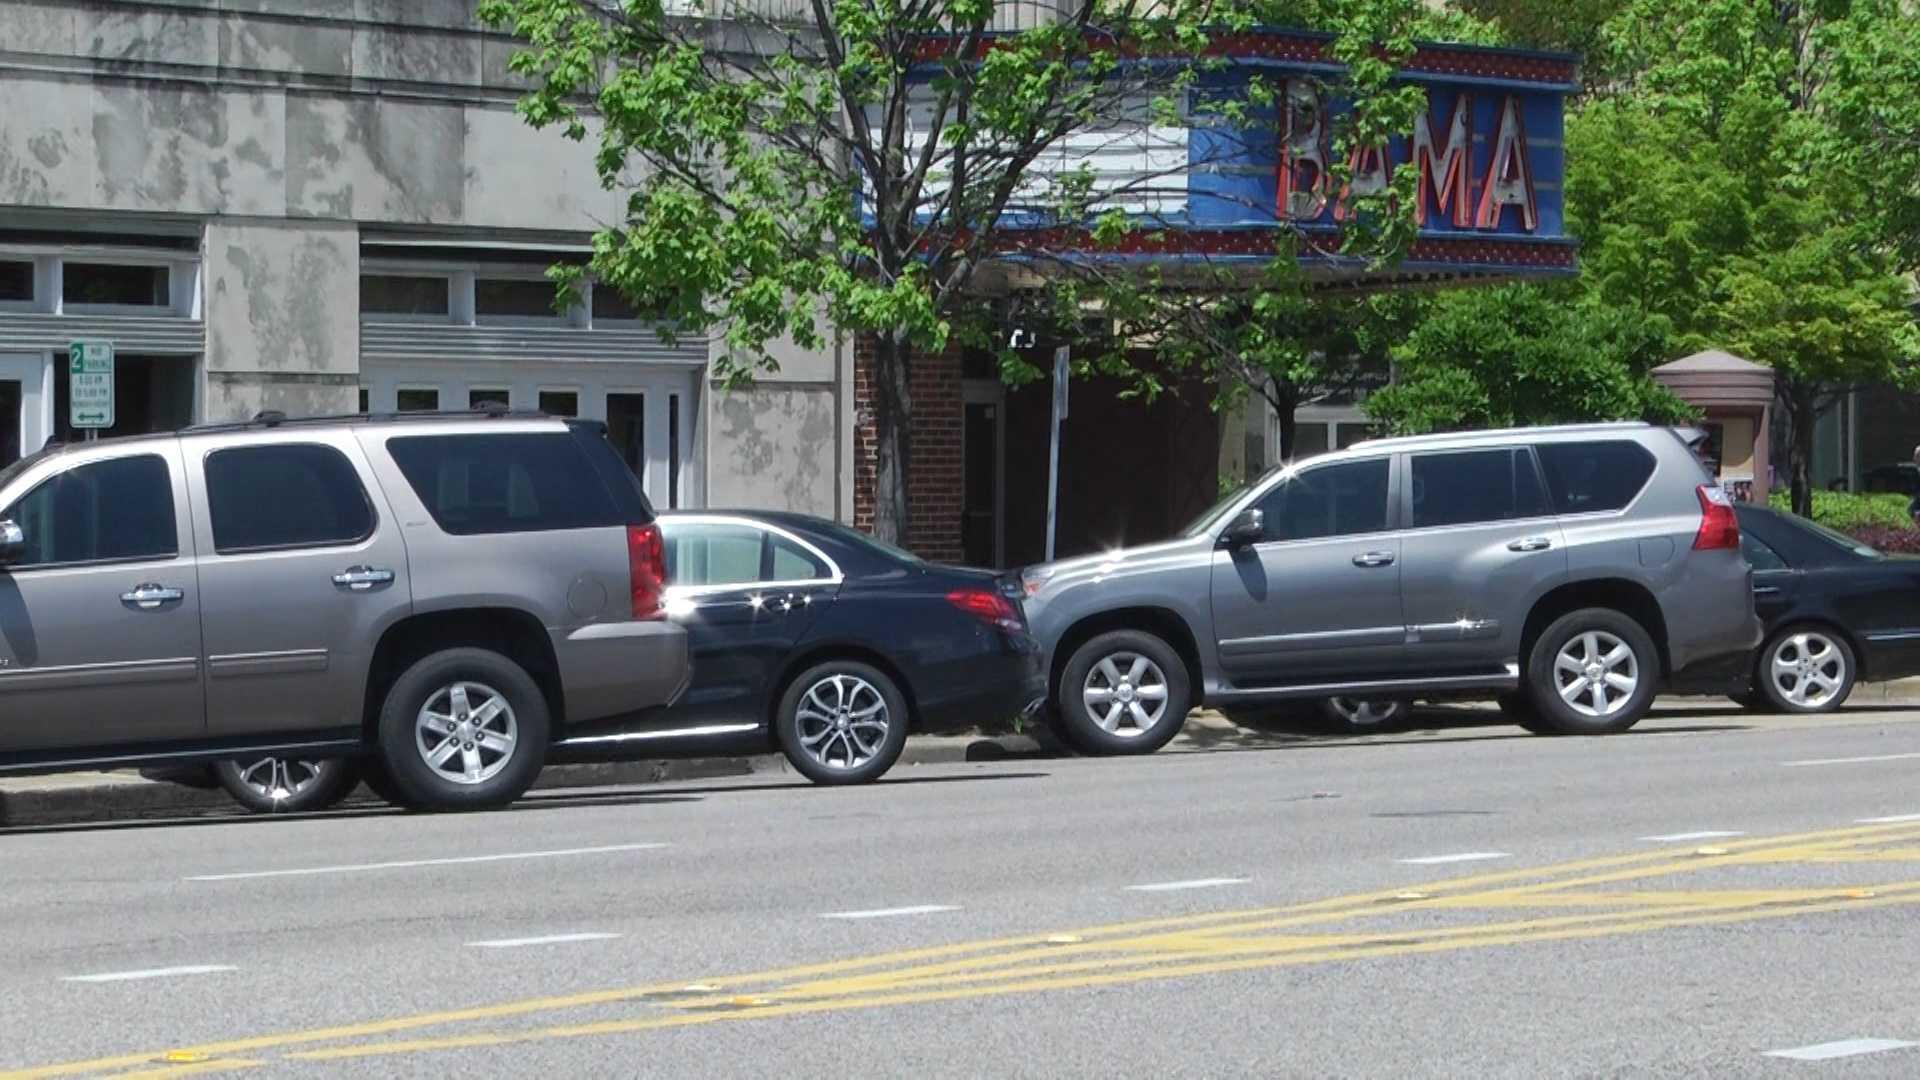 Downtown Tuscaloosa parking.jpg